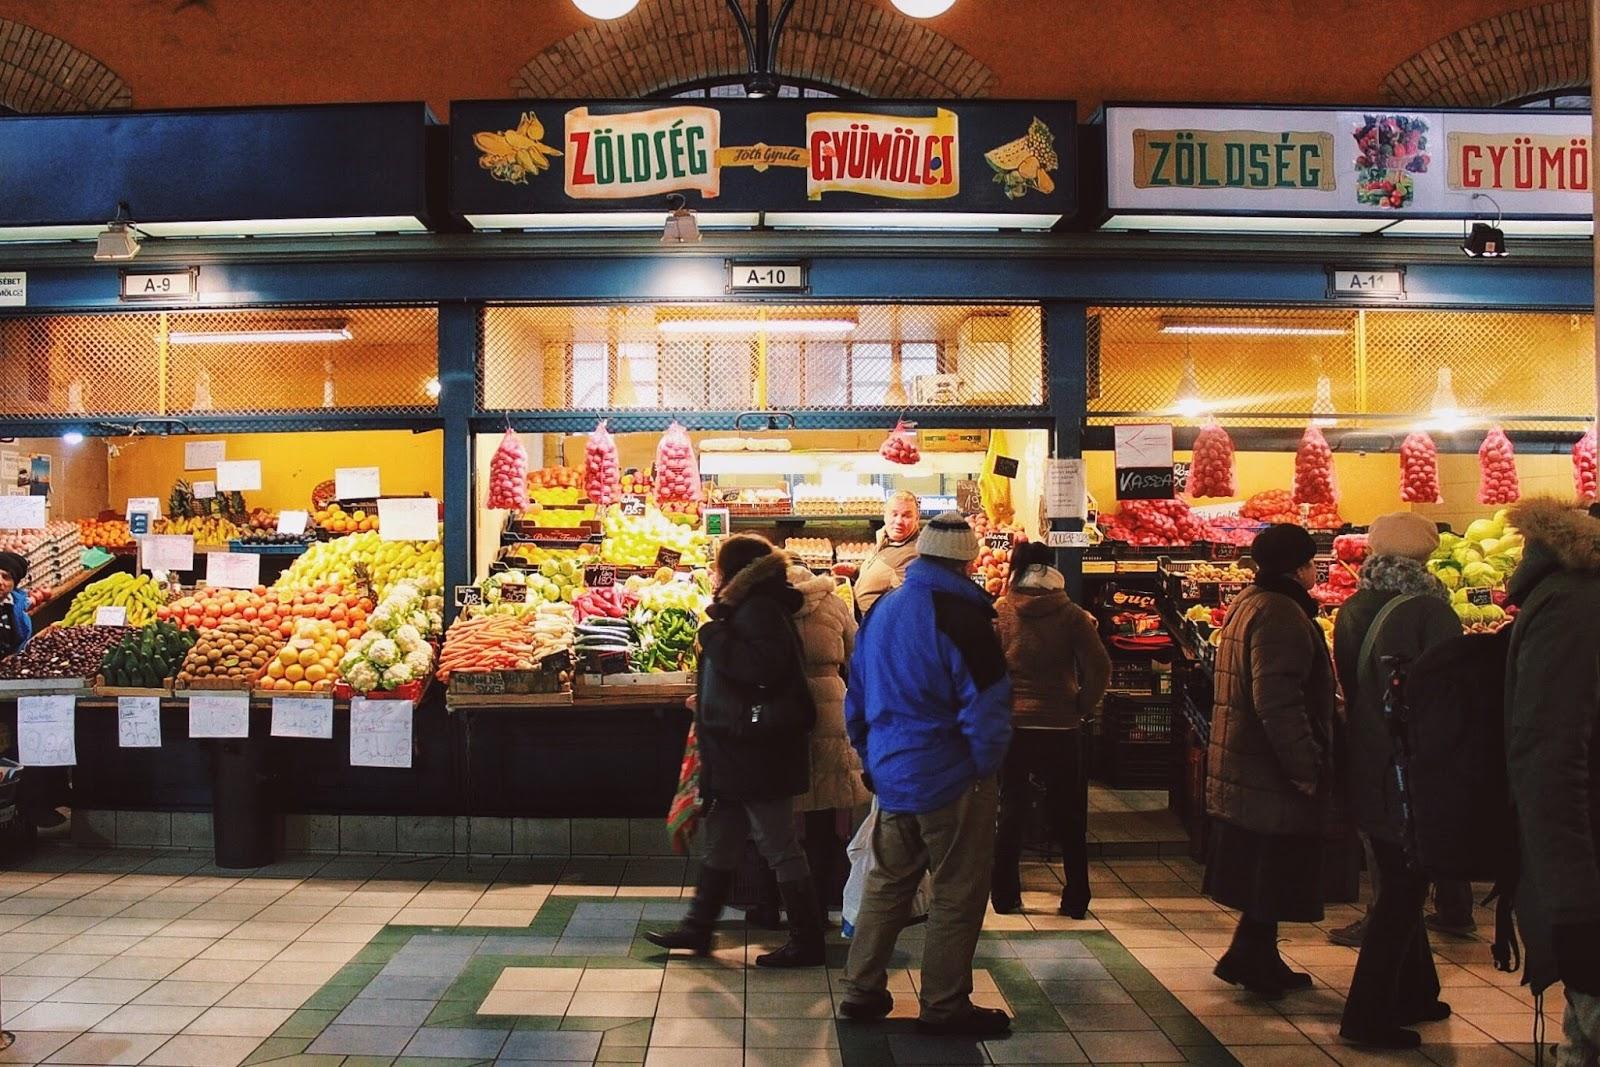 lifesthayle-budapest-great-market-hall-zoldseg-gyumoles.JPG